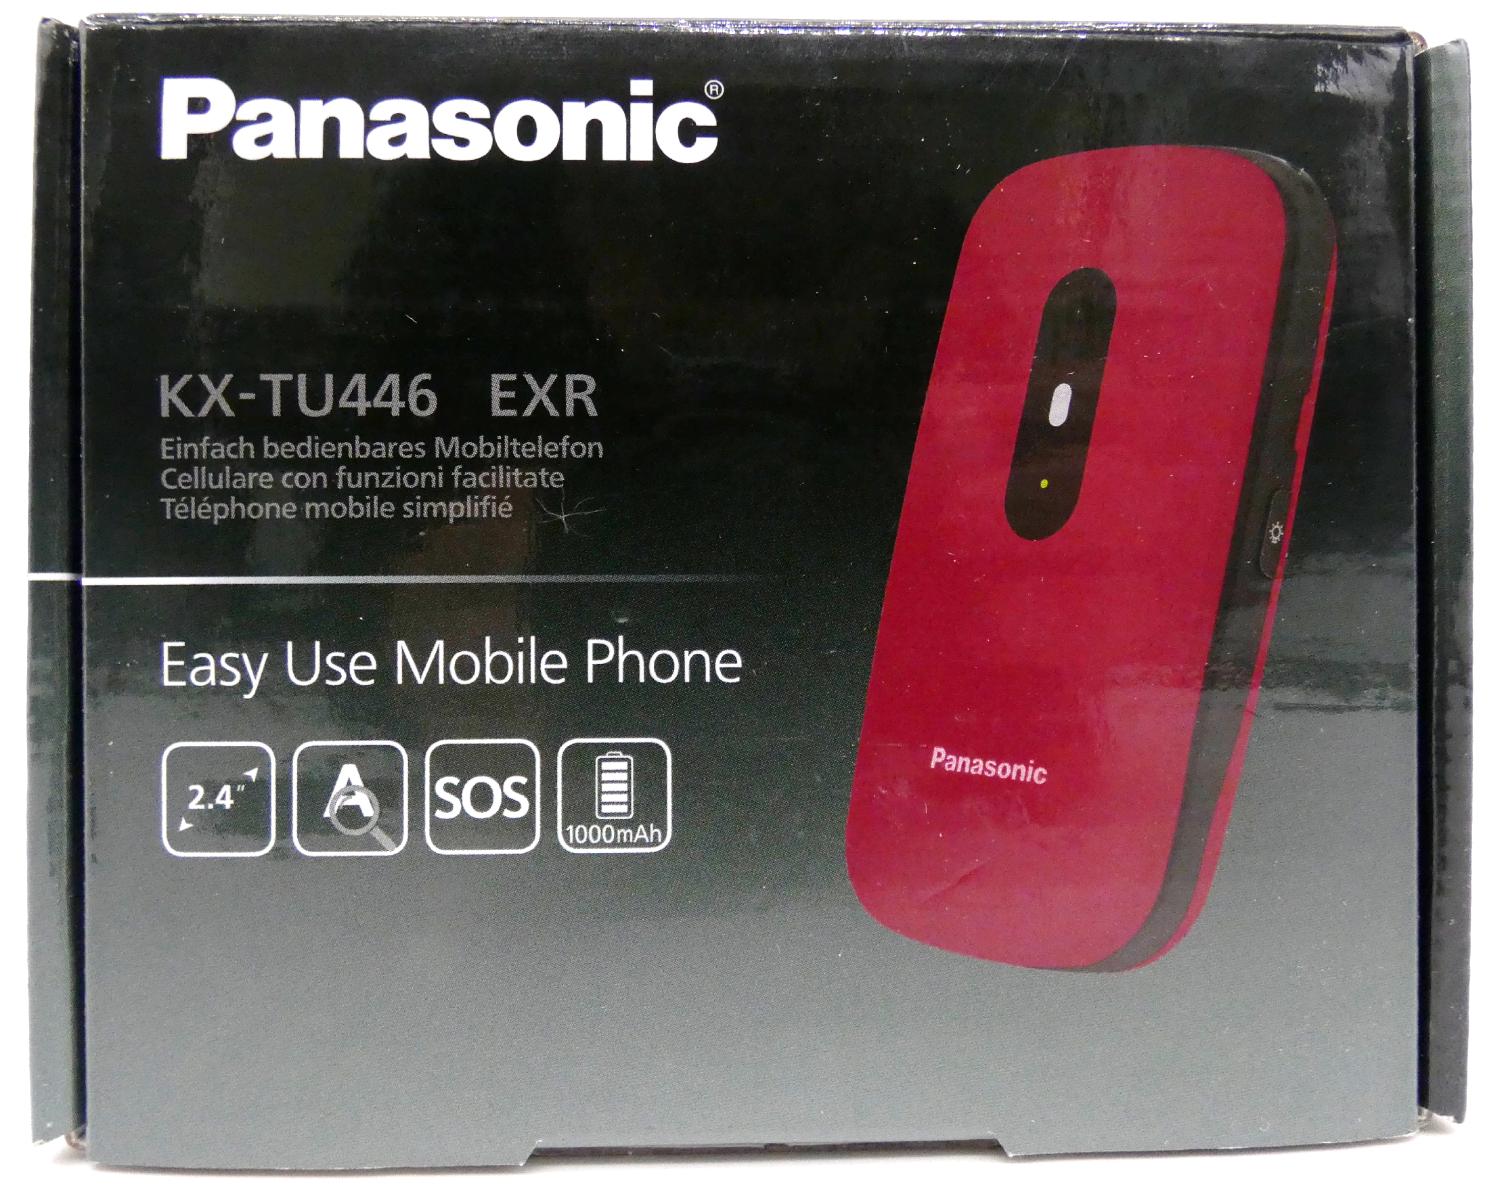 Panasonic KX-TU446 rot Smartphone Handy Senioren SOS-Taste Klapphandy OVP